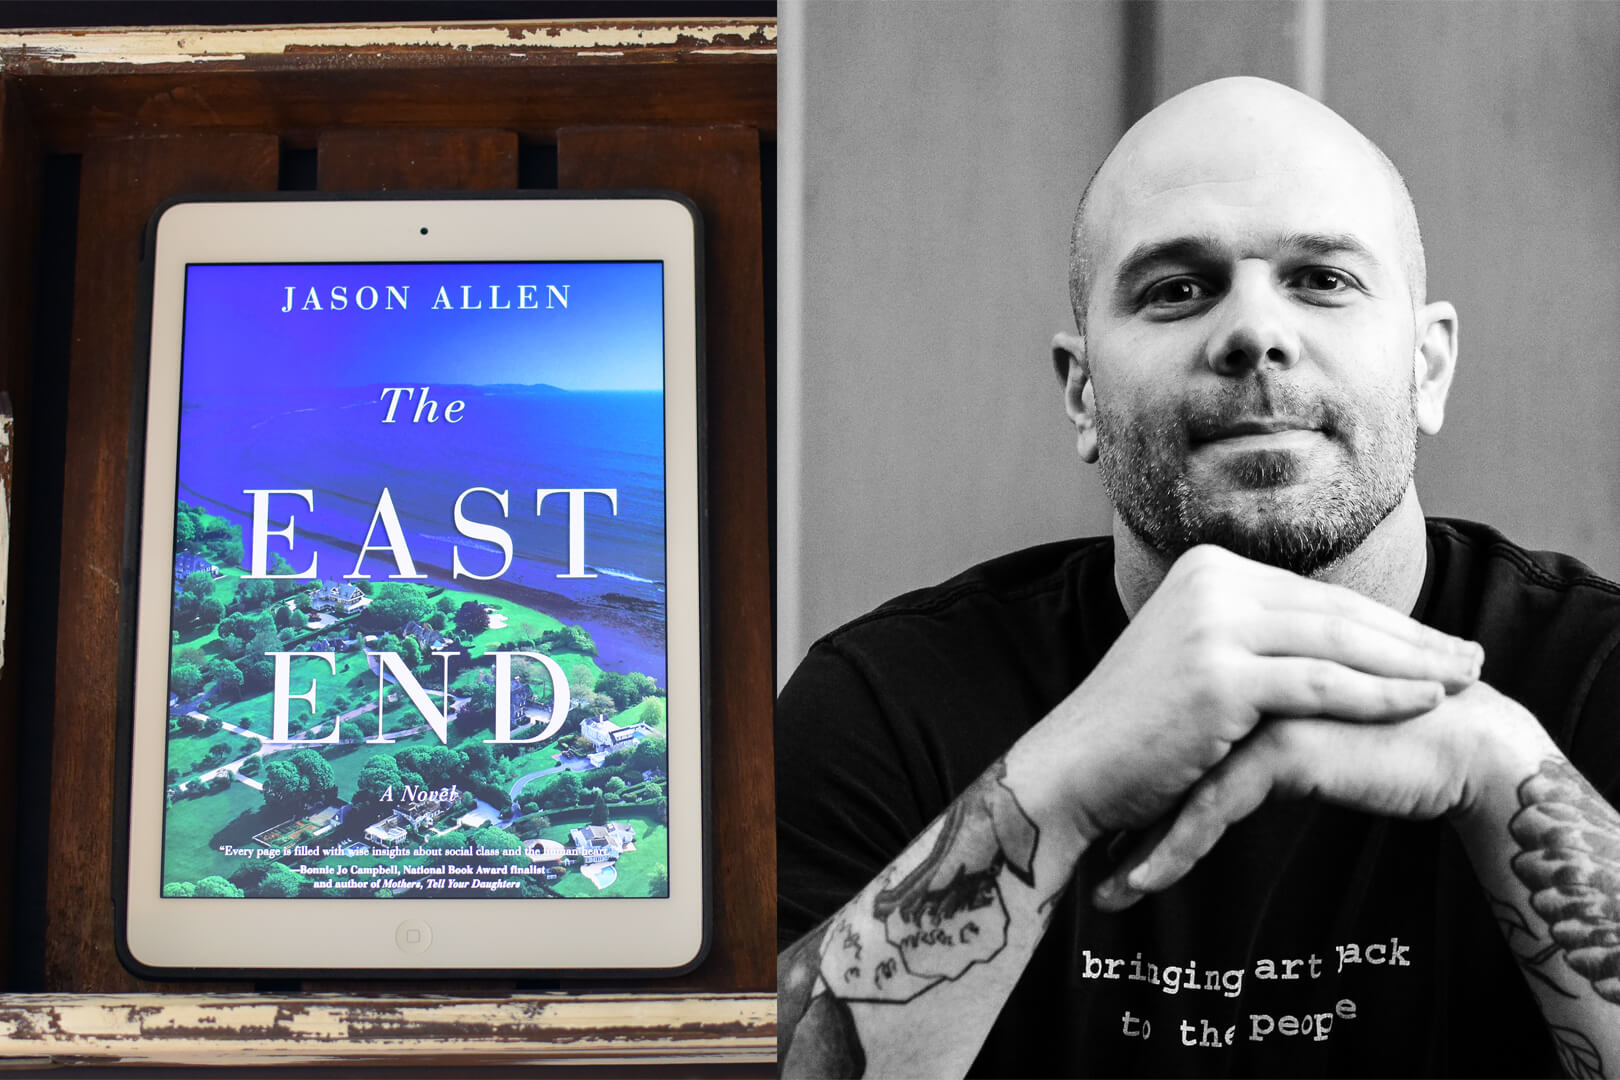 The East End Jason Allen Author Q&A - Book Club Chat